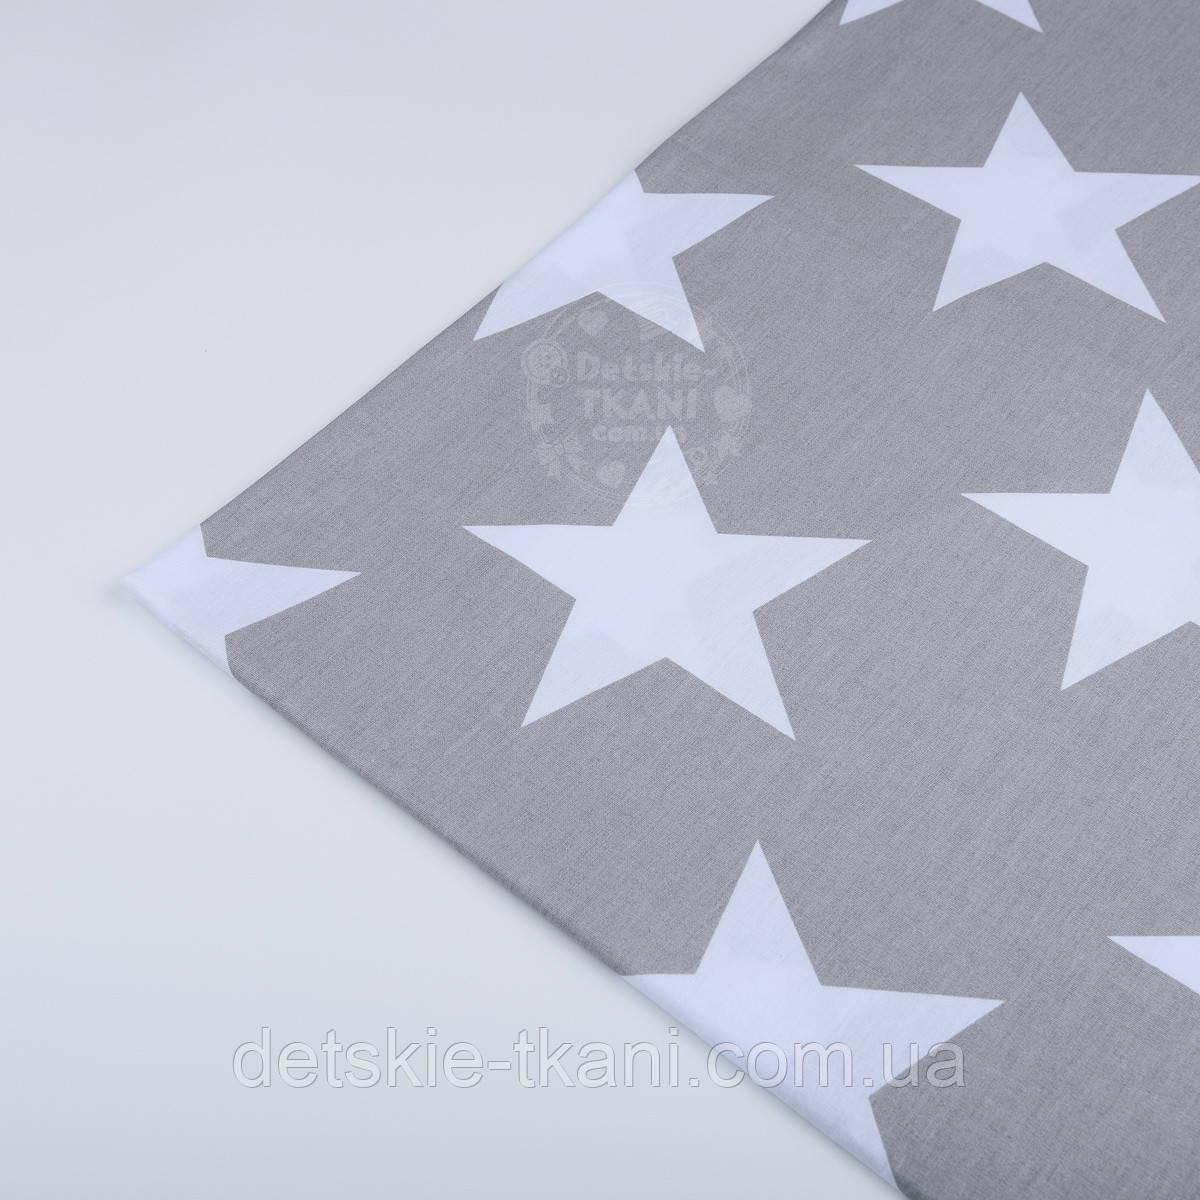 Отрез ткани №952  с белыми макси-звёздами 12 см на сером фоне